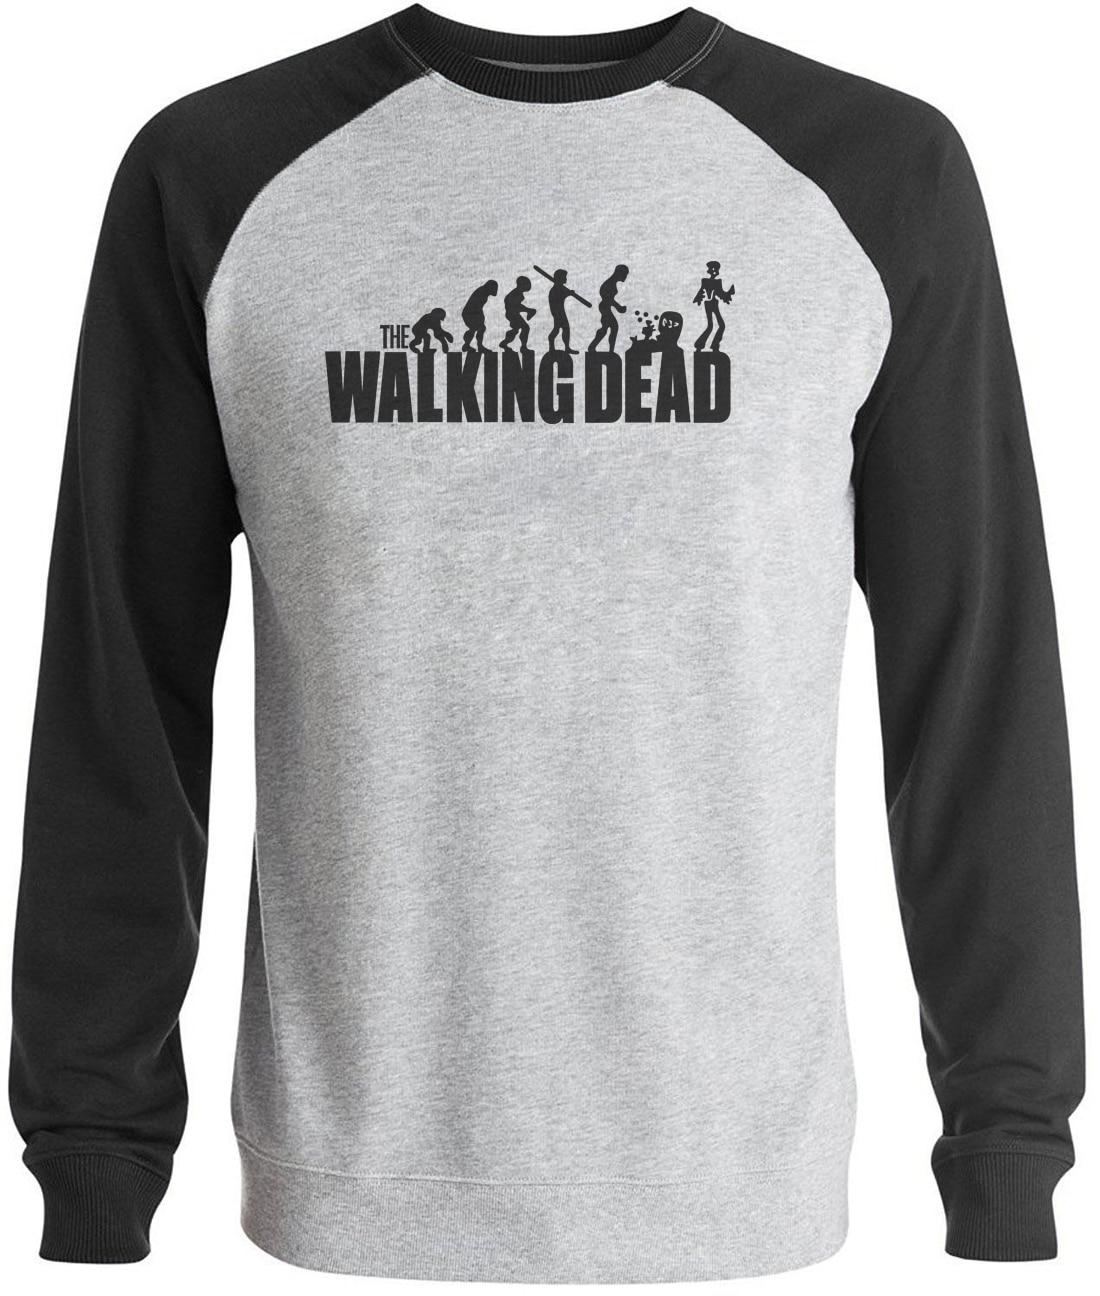 Sweatshirt Casual Raglan Long Sleeve Brand Clothing 2019 Autumn Winter The Walking Dead Men Funny Tracksuit Hip Hop Hooded Male